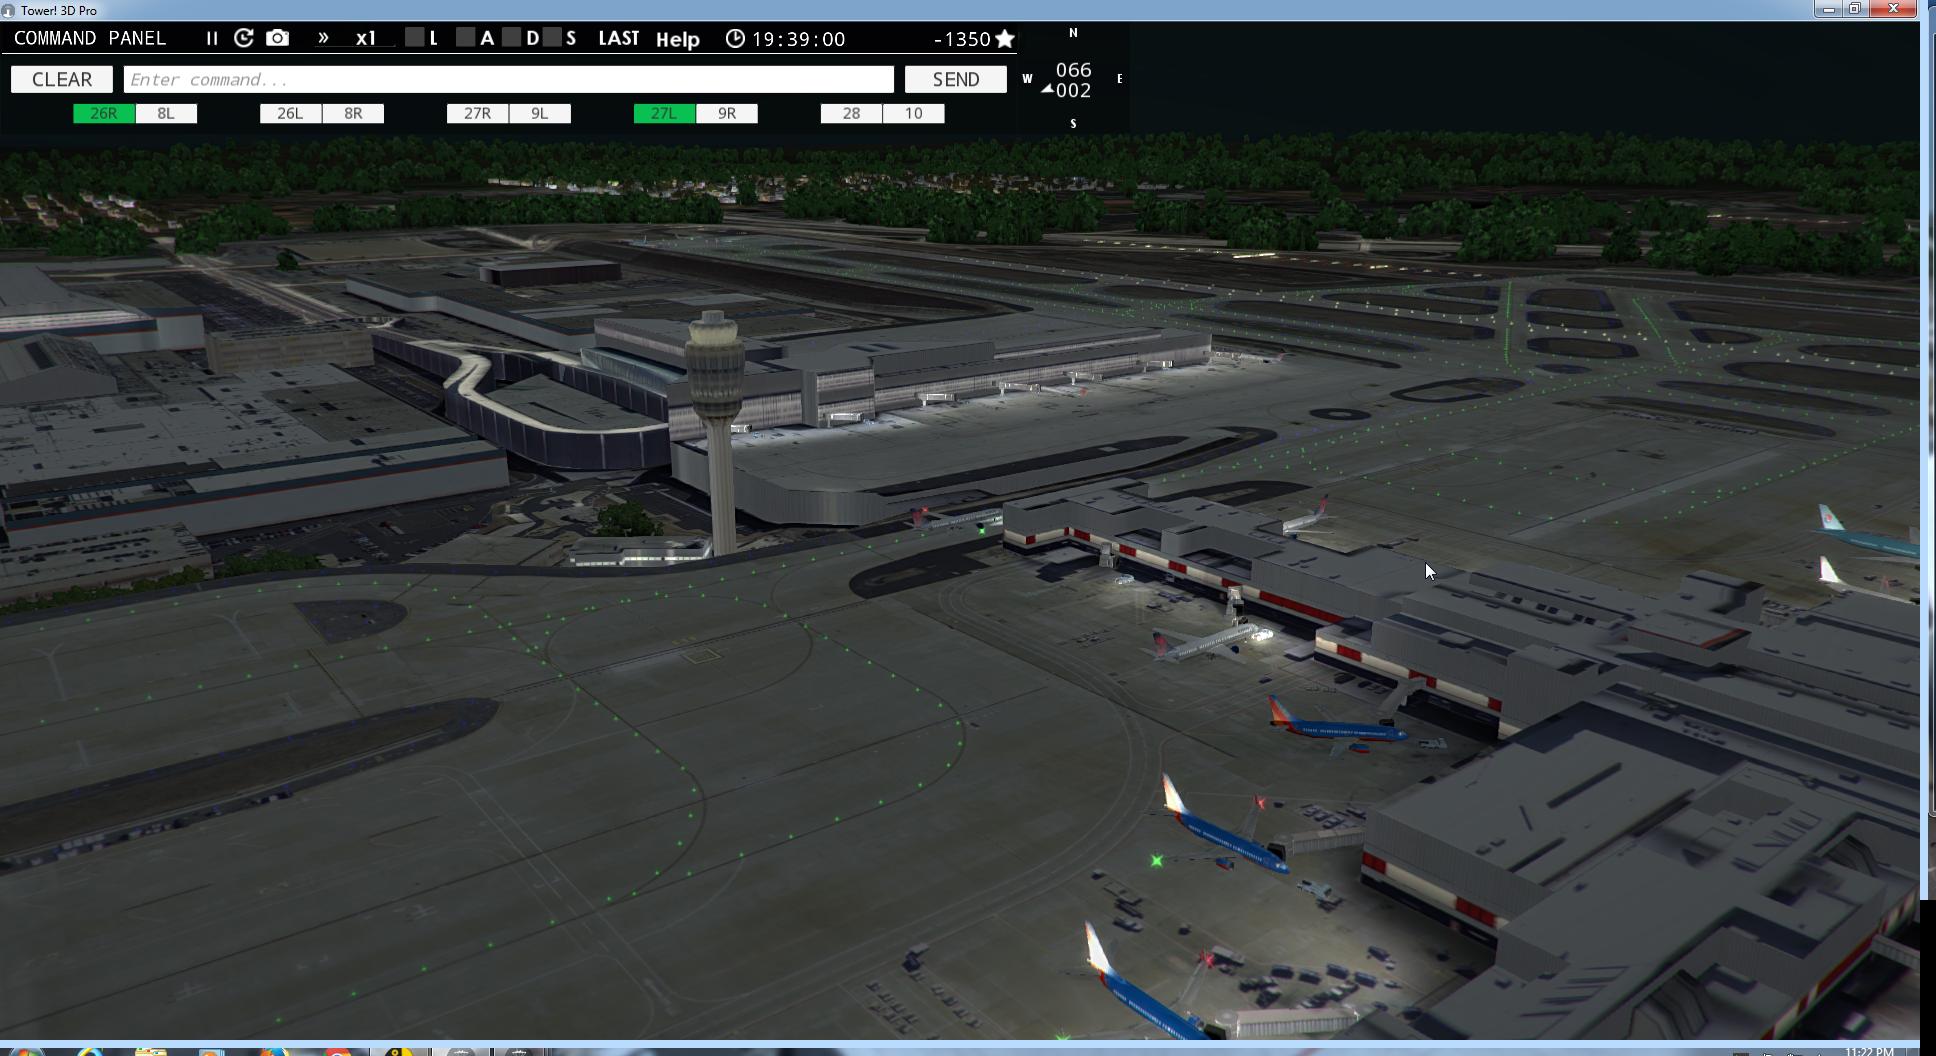 Tower!3D and Pro KATL Tower View - ATC Simulators - The